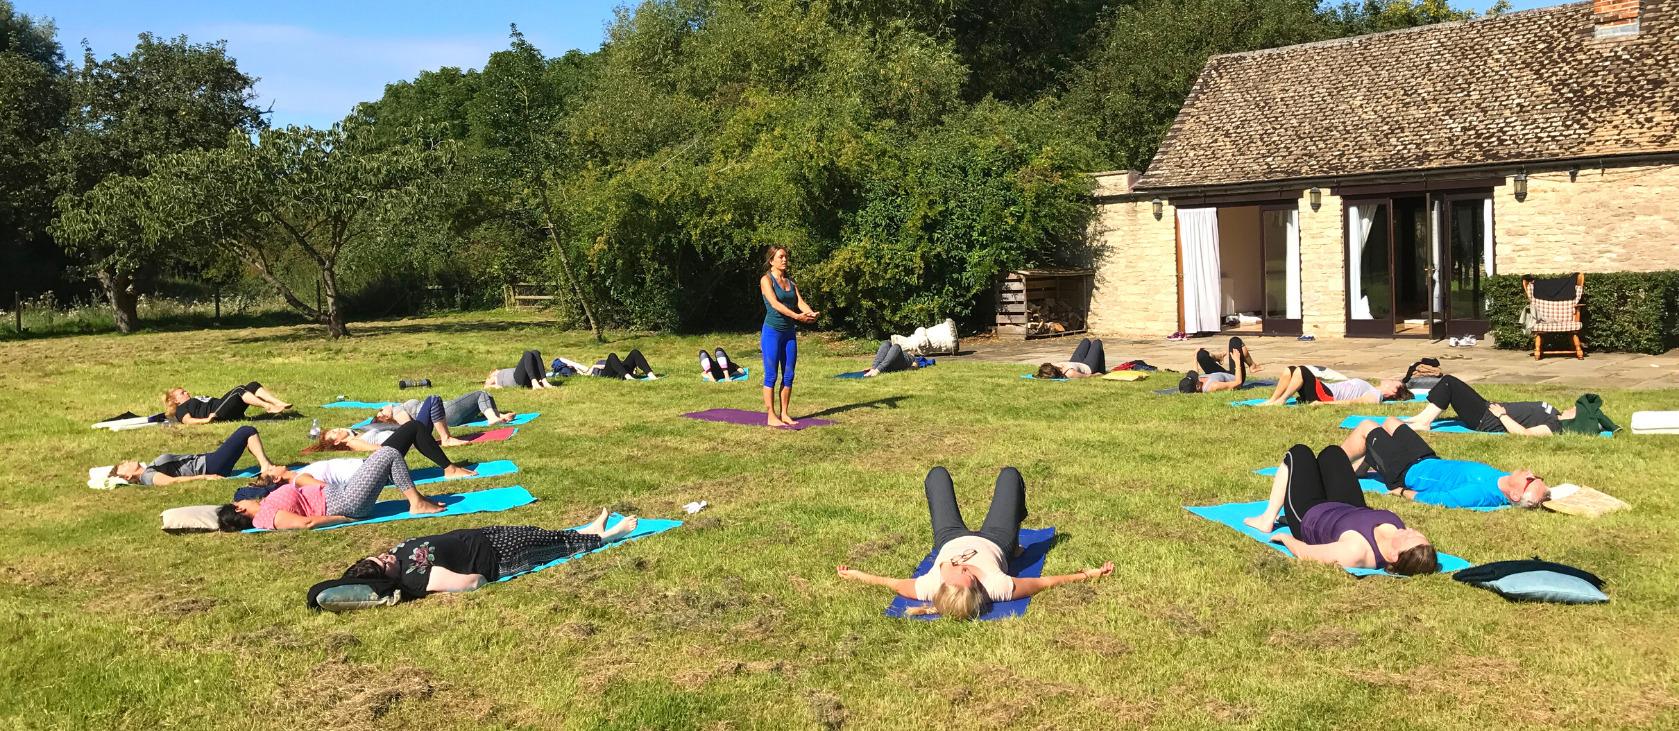 yoga outside on grass